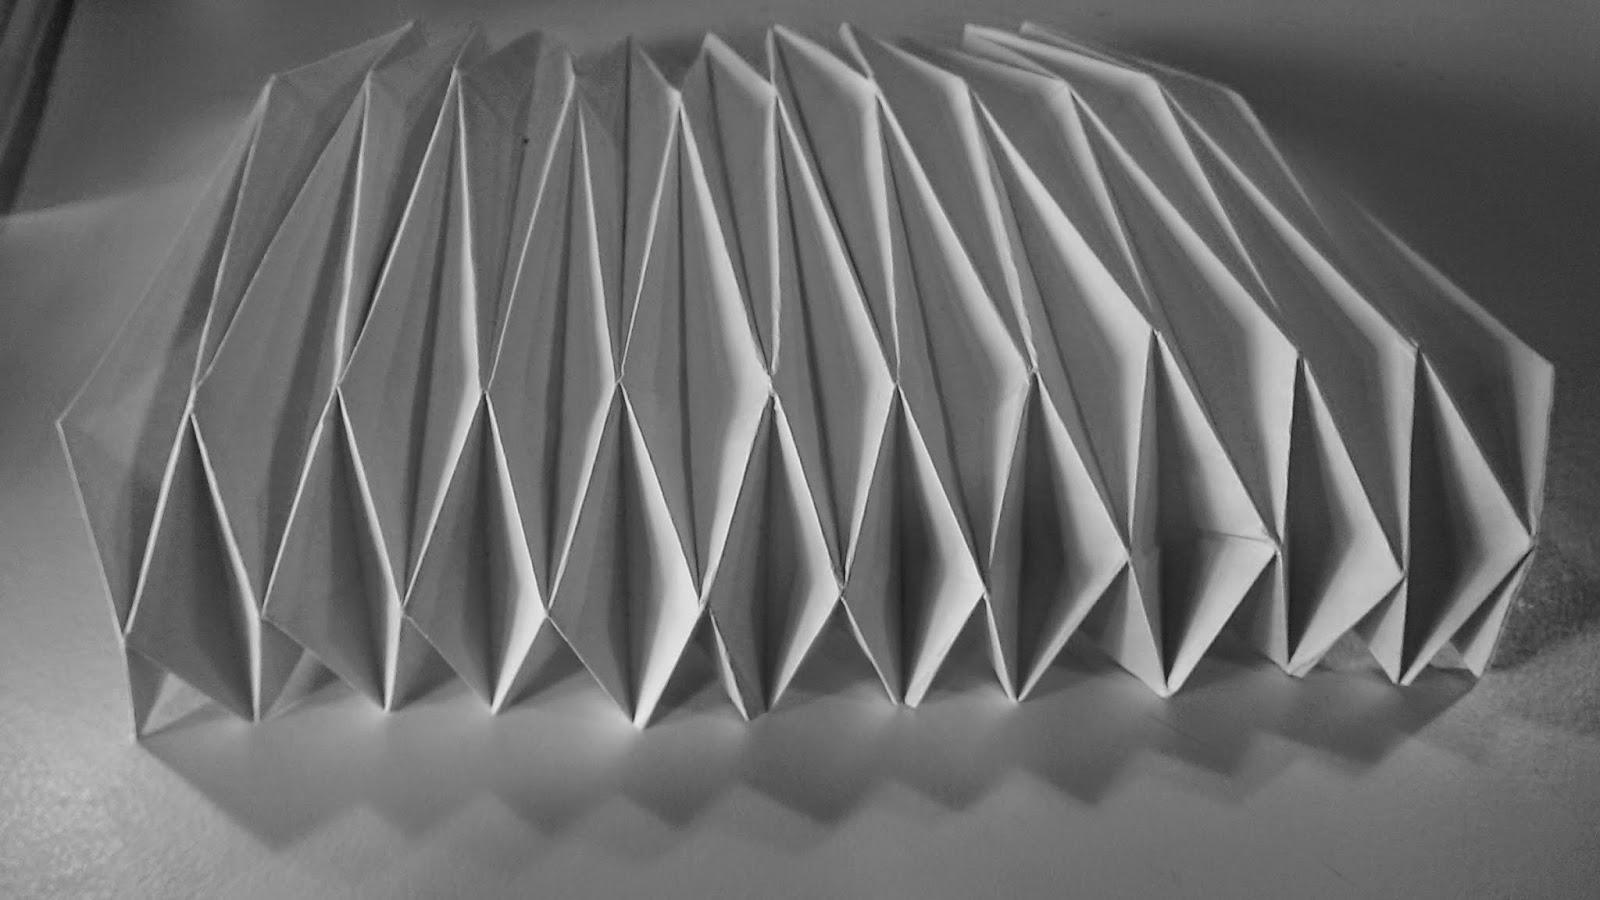 Yoshimura Pattern Folds To Generate A Form